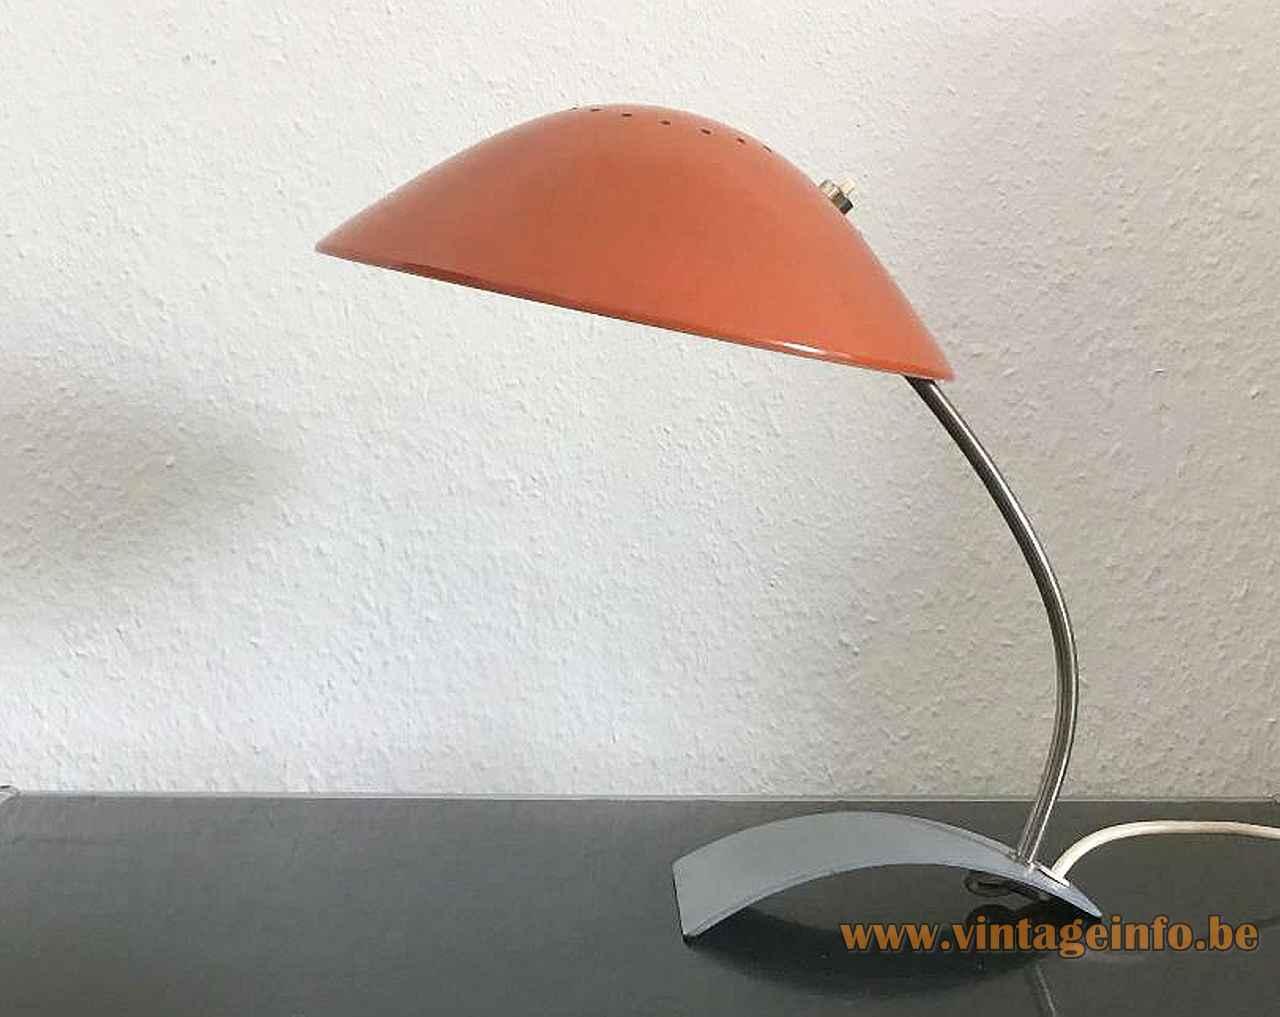 Kaiser Leuchten desk lamp 6840 curved metal base chrome rod round mushroom lampshade 1960s 1970s Germany